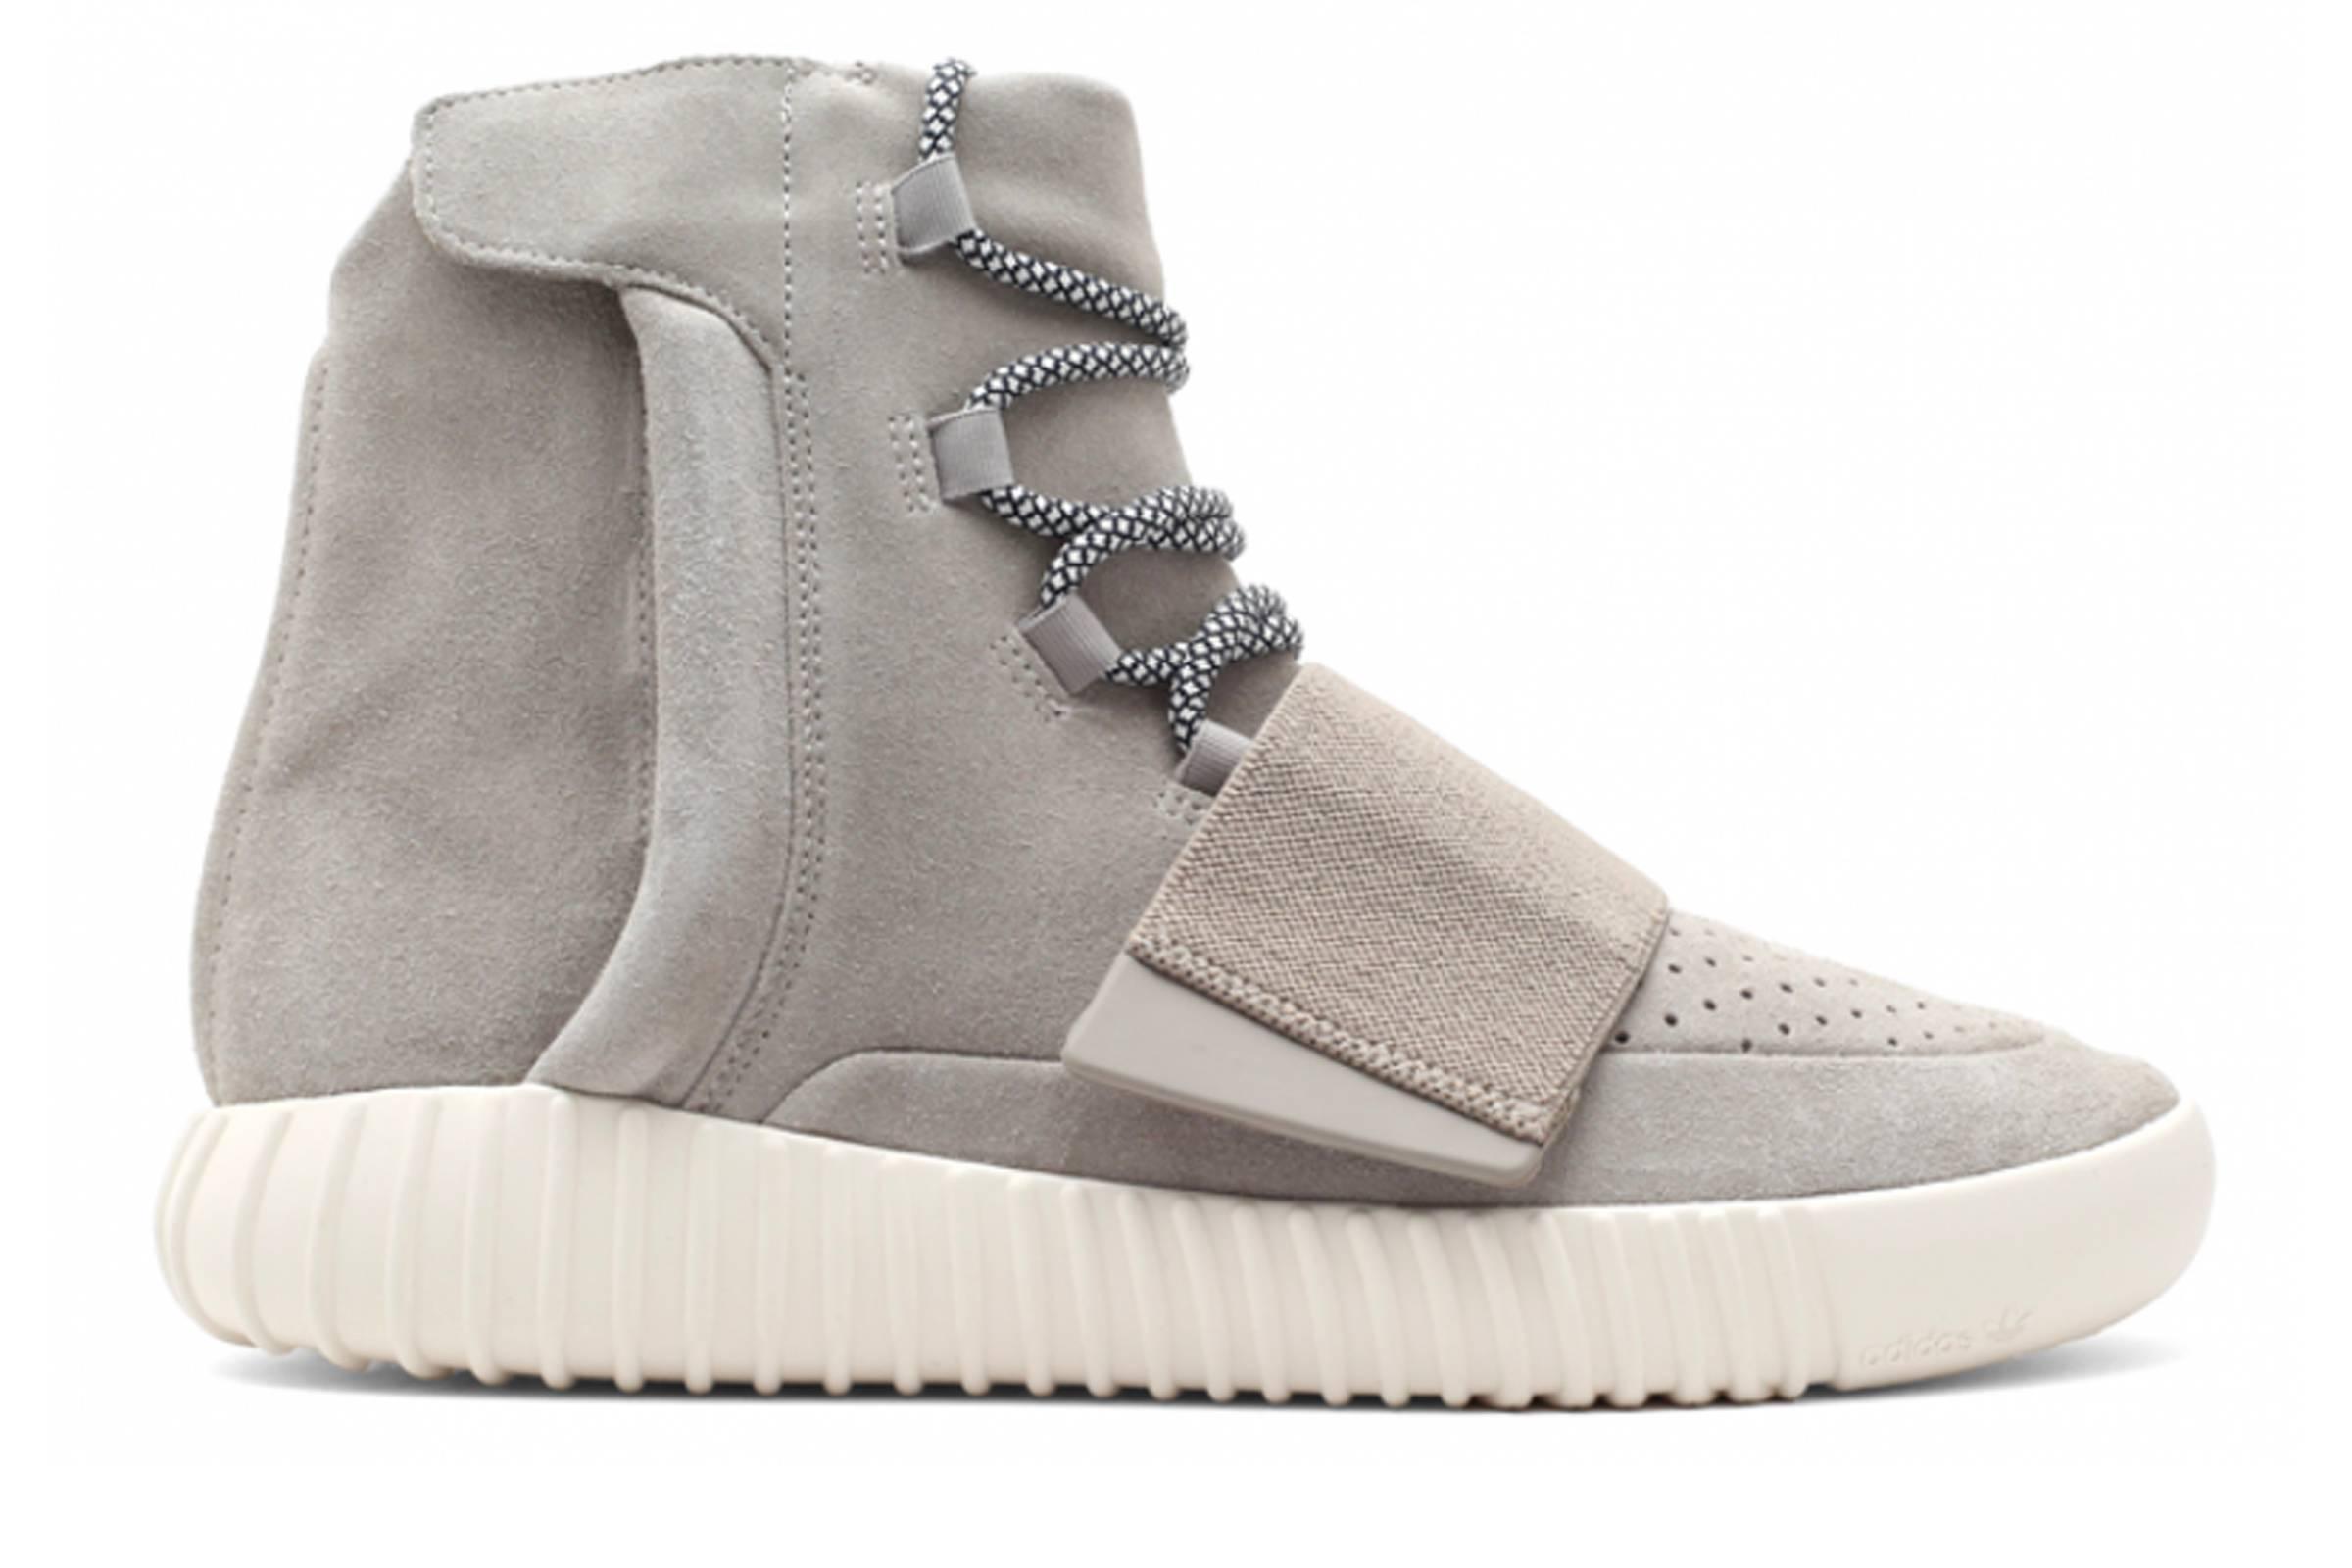 "adidas Yeezy Boost 750 OG ""Light Brown"""